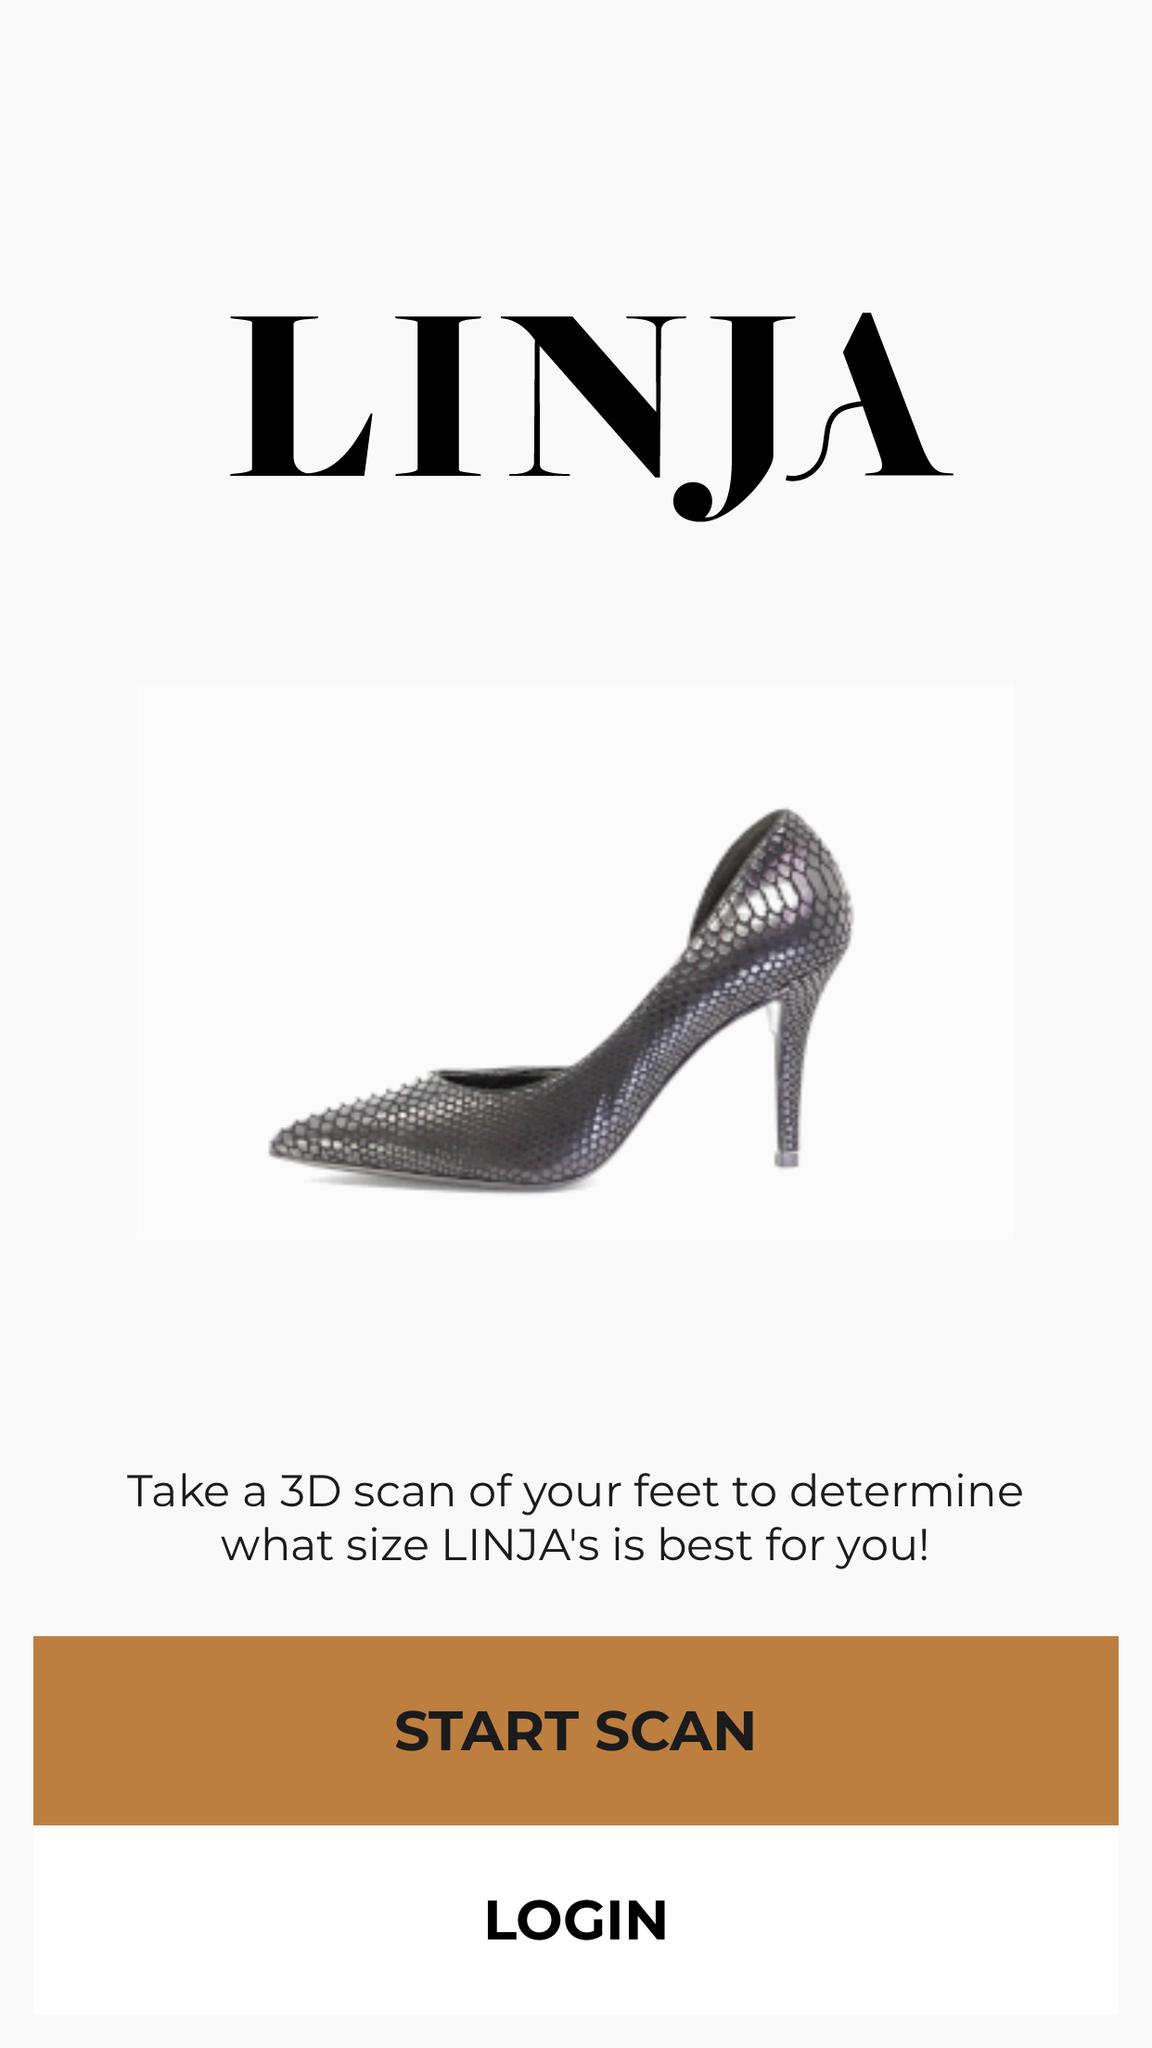 3D scan app - step 1